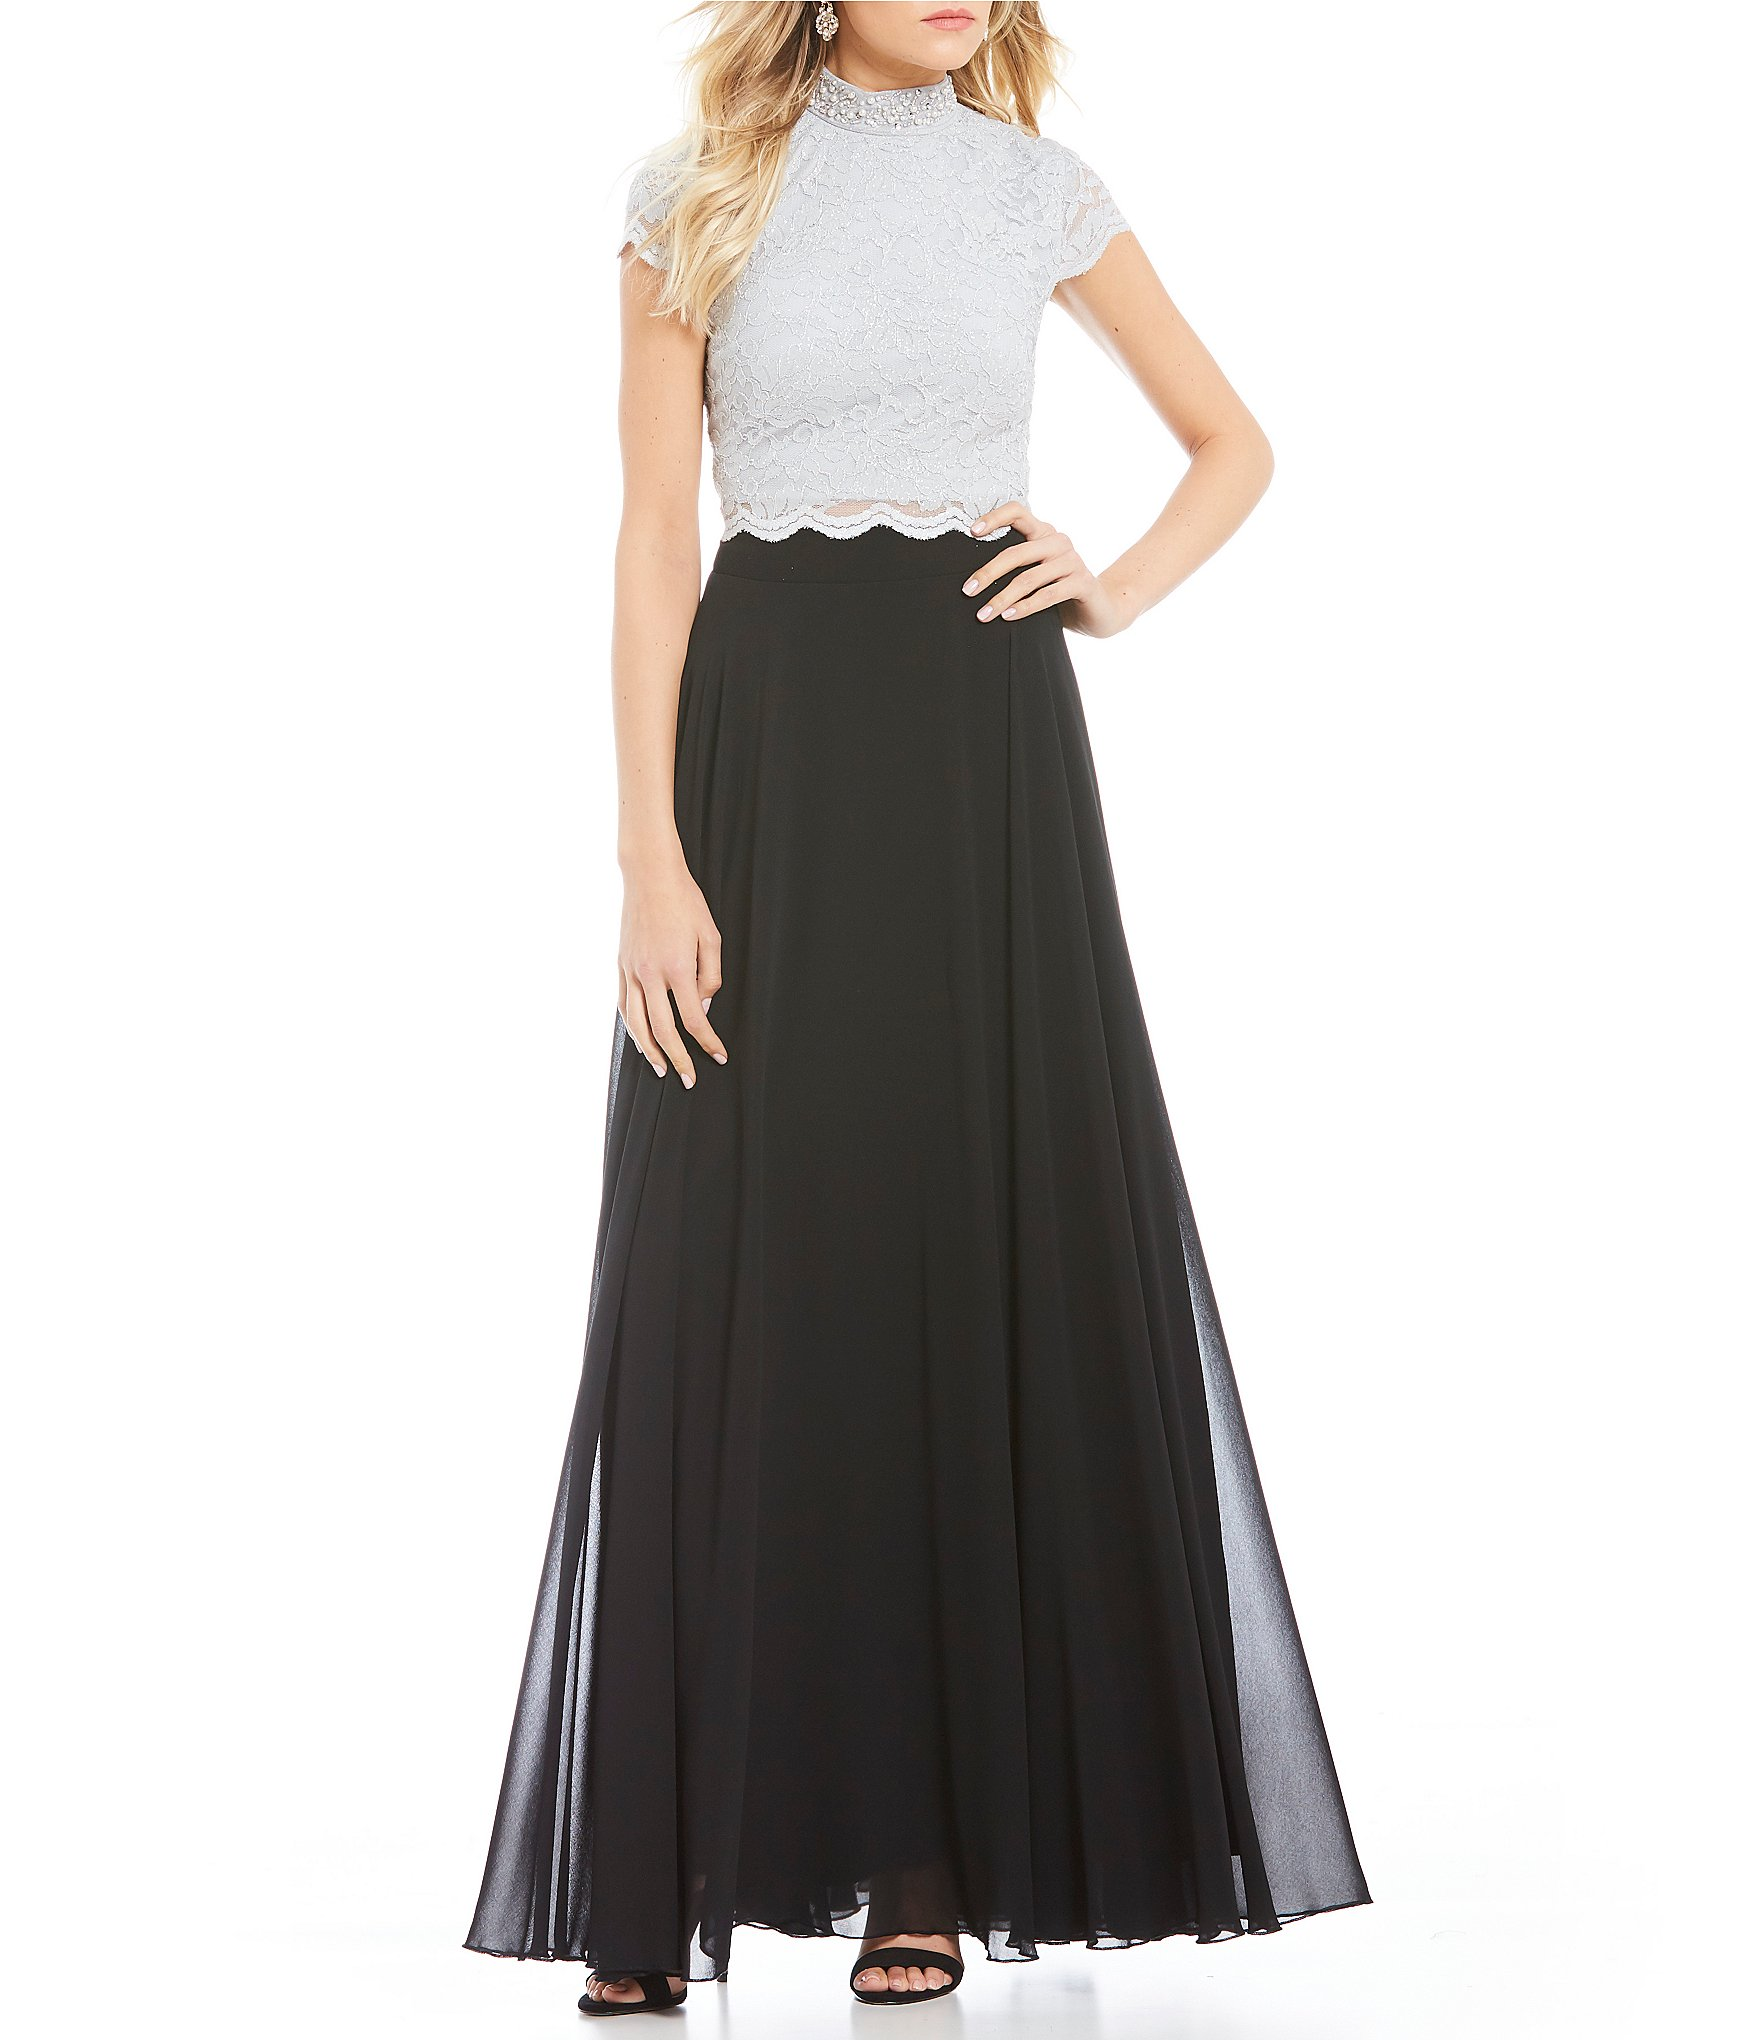 Black long dresses formal